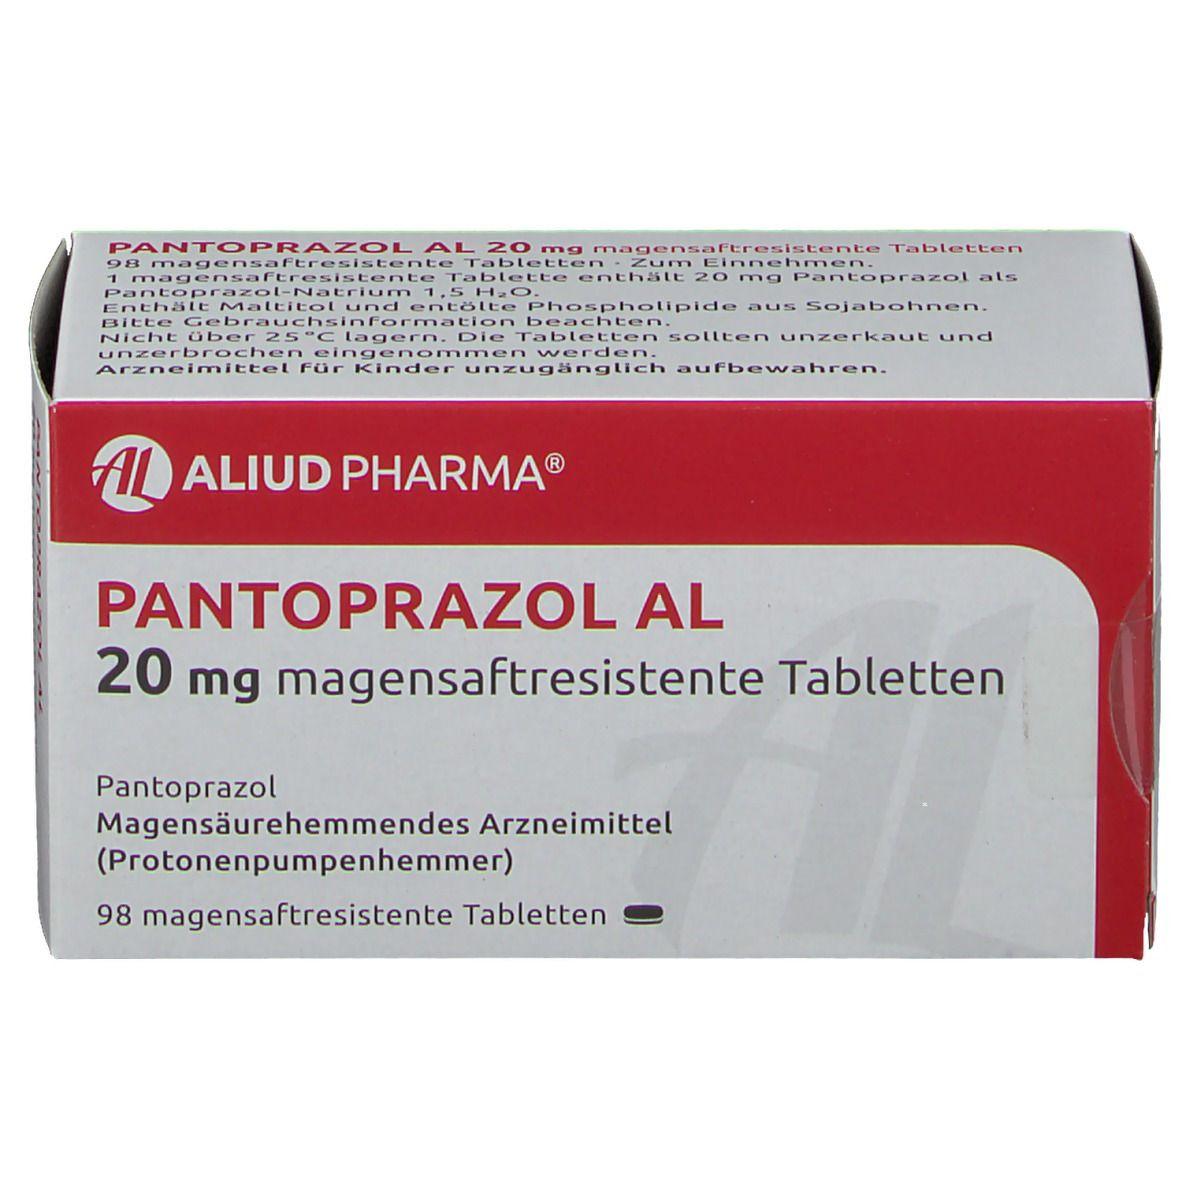 Pantoprazol AL 20 mg Tabletten